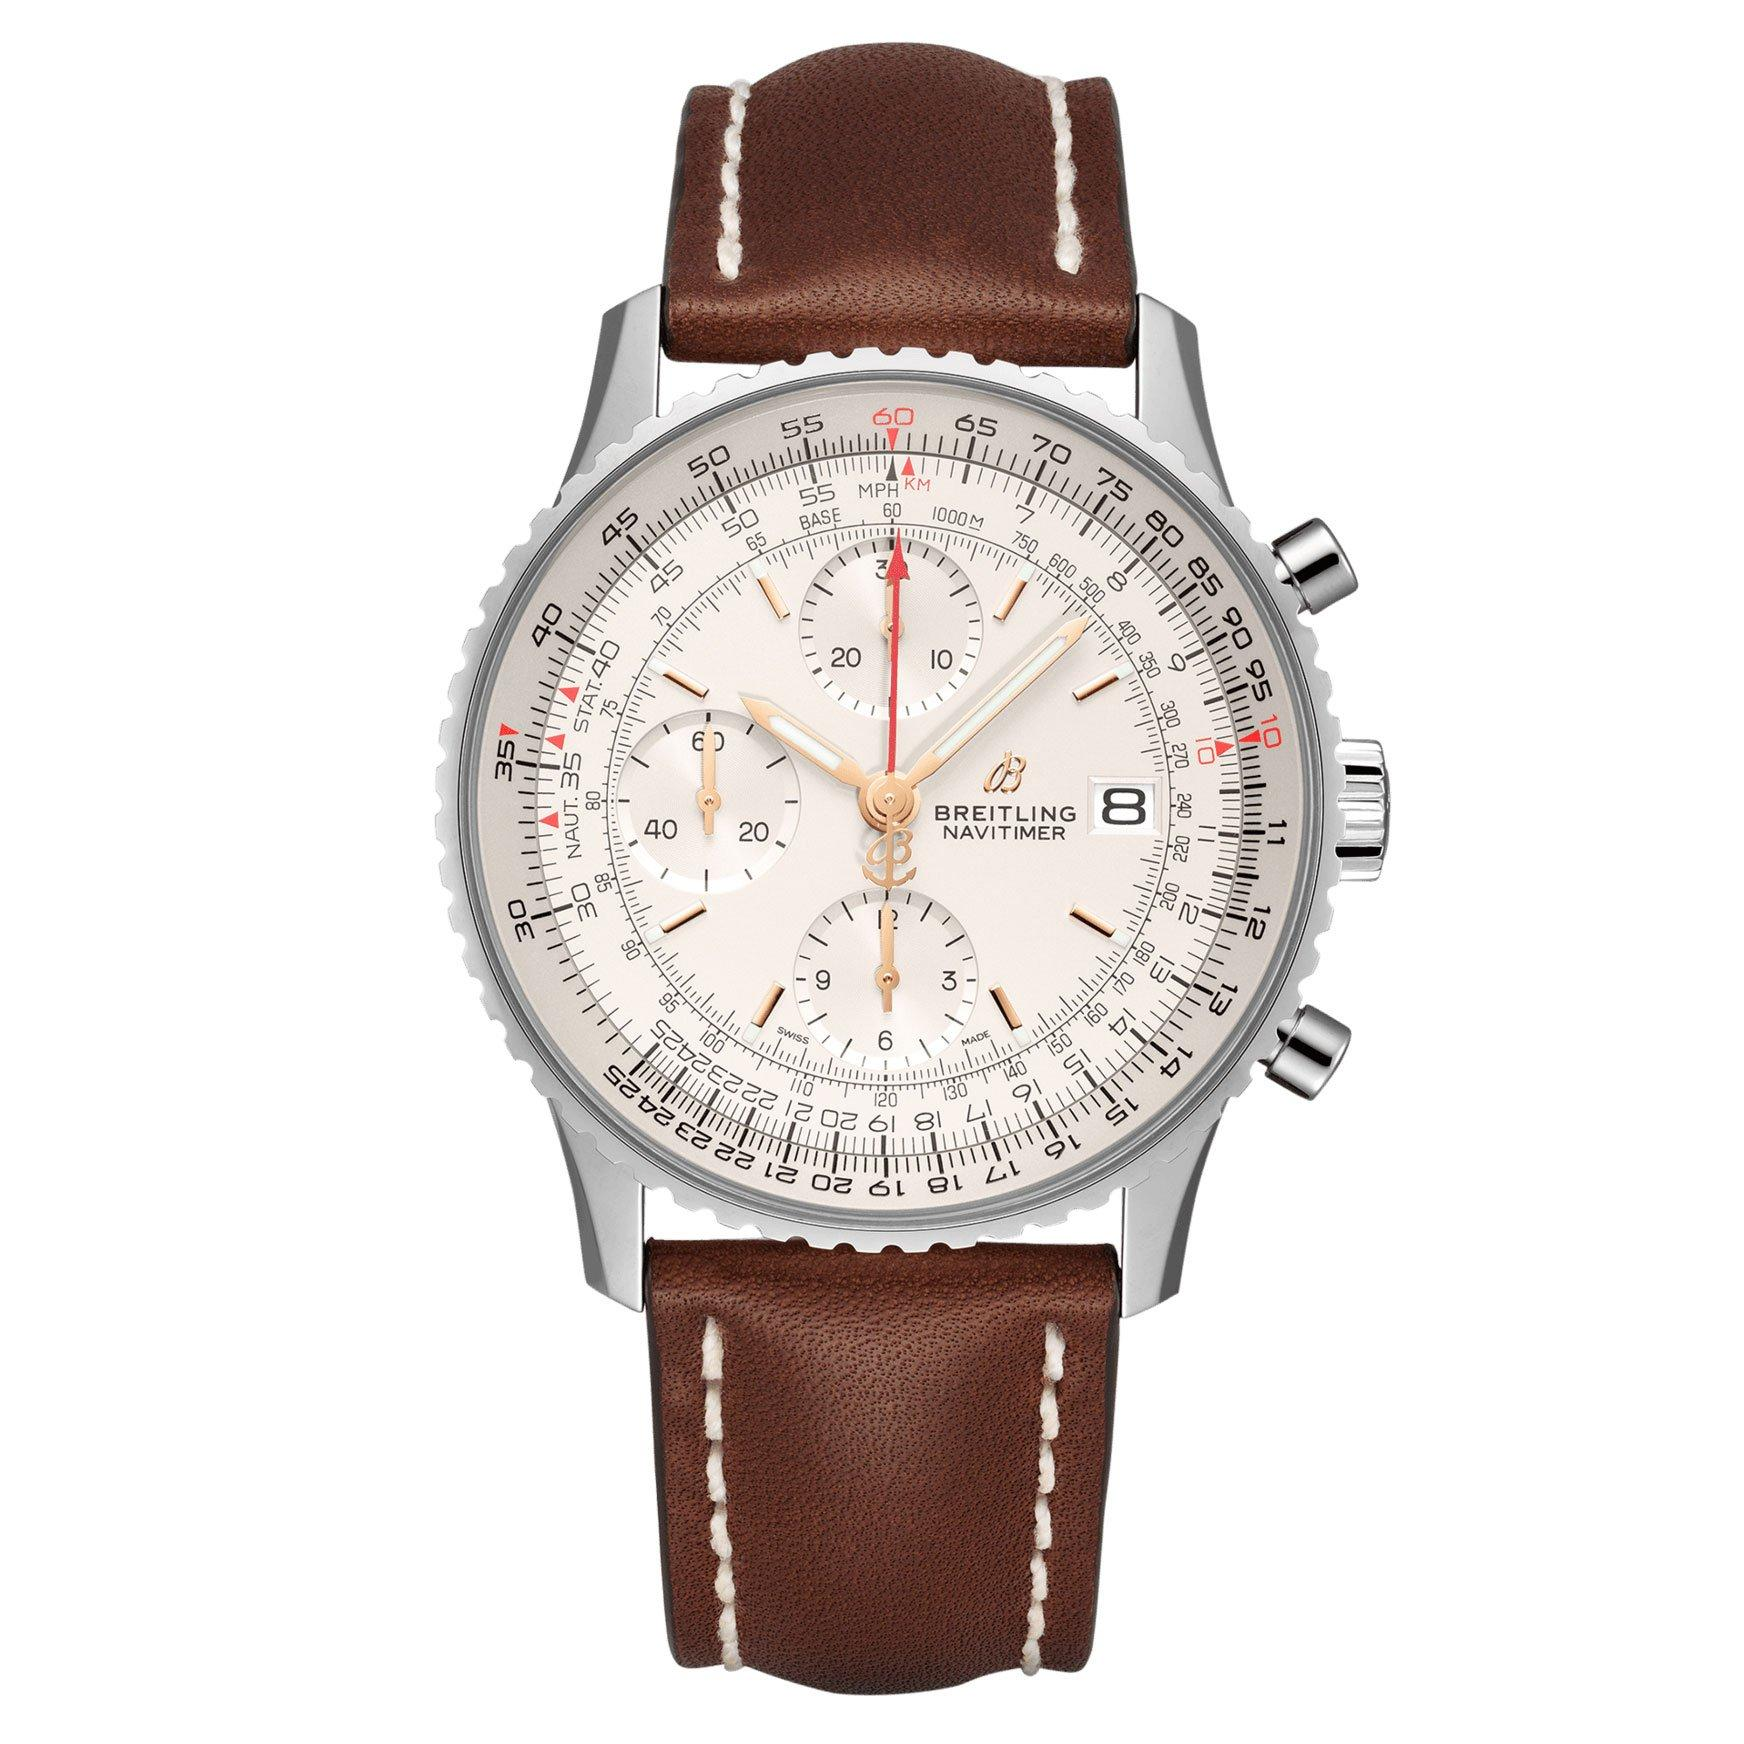 Breitling Navitimer 1 Chronograph 41 Men's Watch